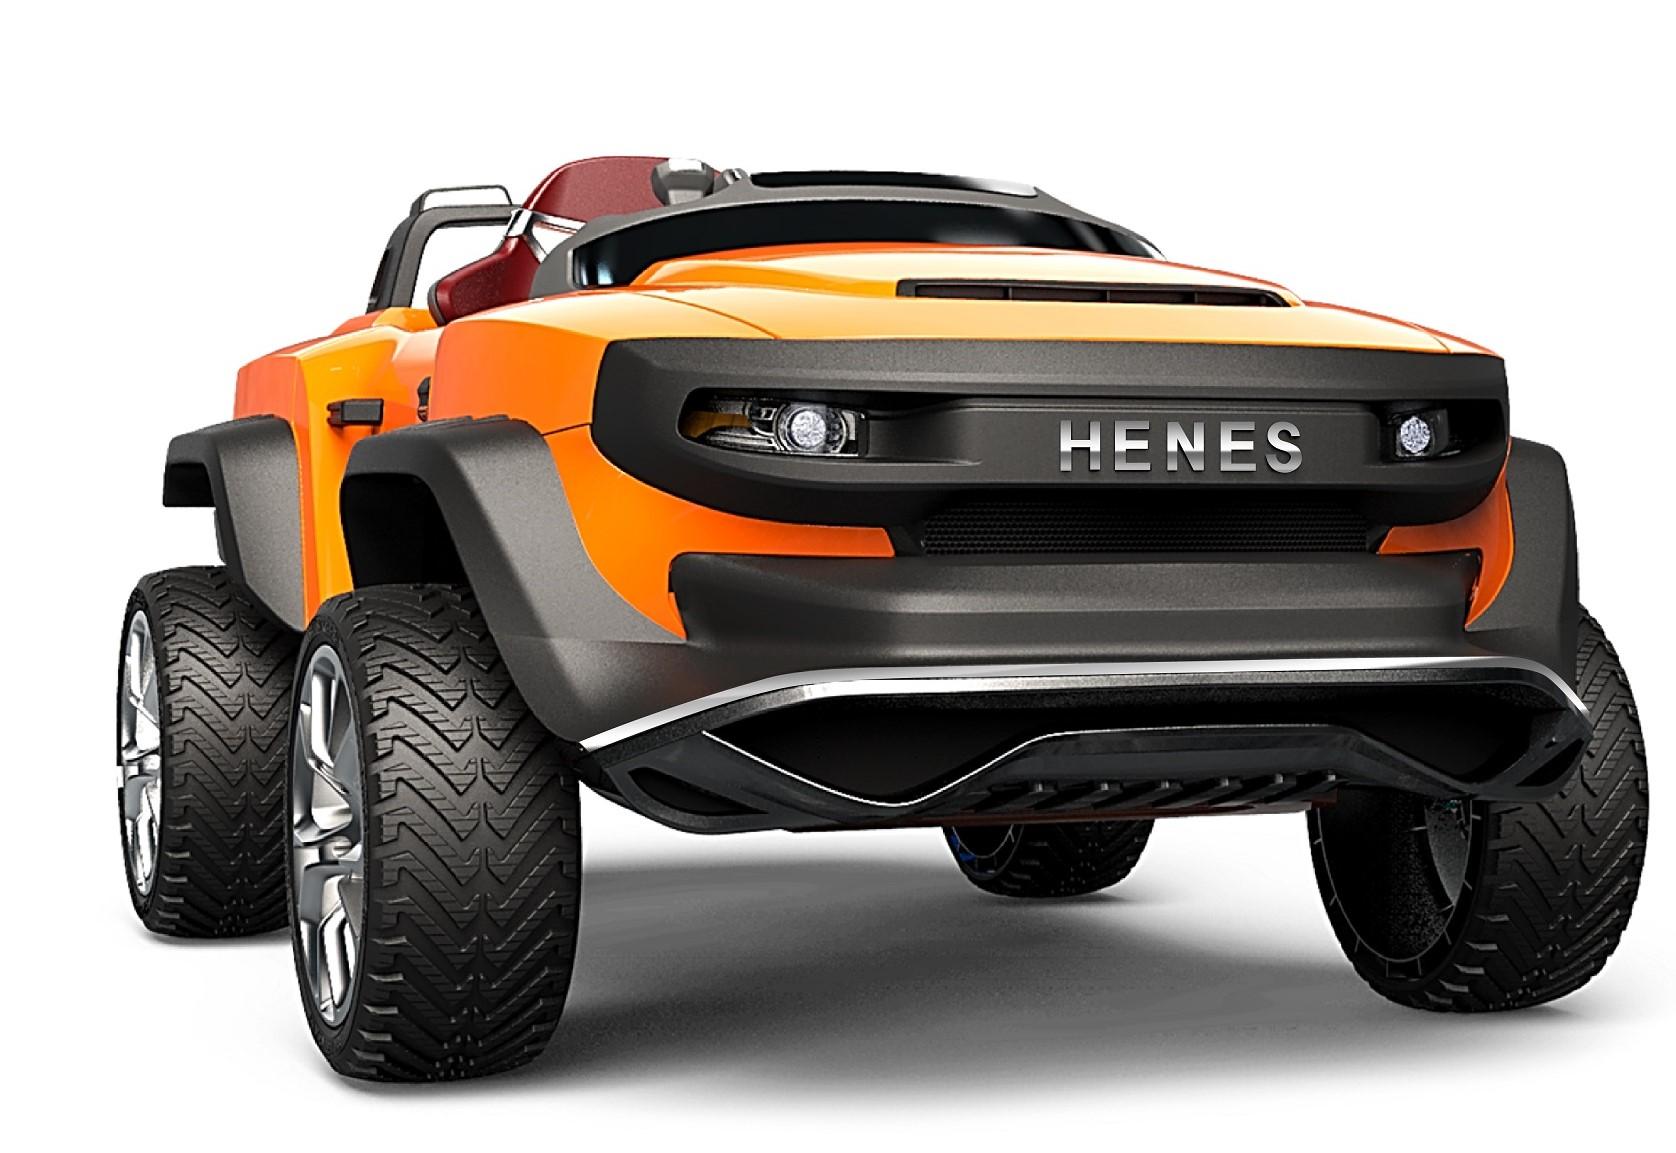 henes broon t870 t8tank orange luxus kinder elektro auto allrad 4x4 24volt kinderauto online. Black Bedroom Furniture Sets. Home Design Ideas